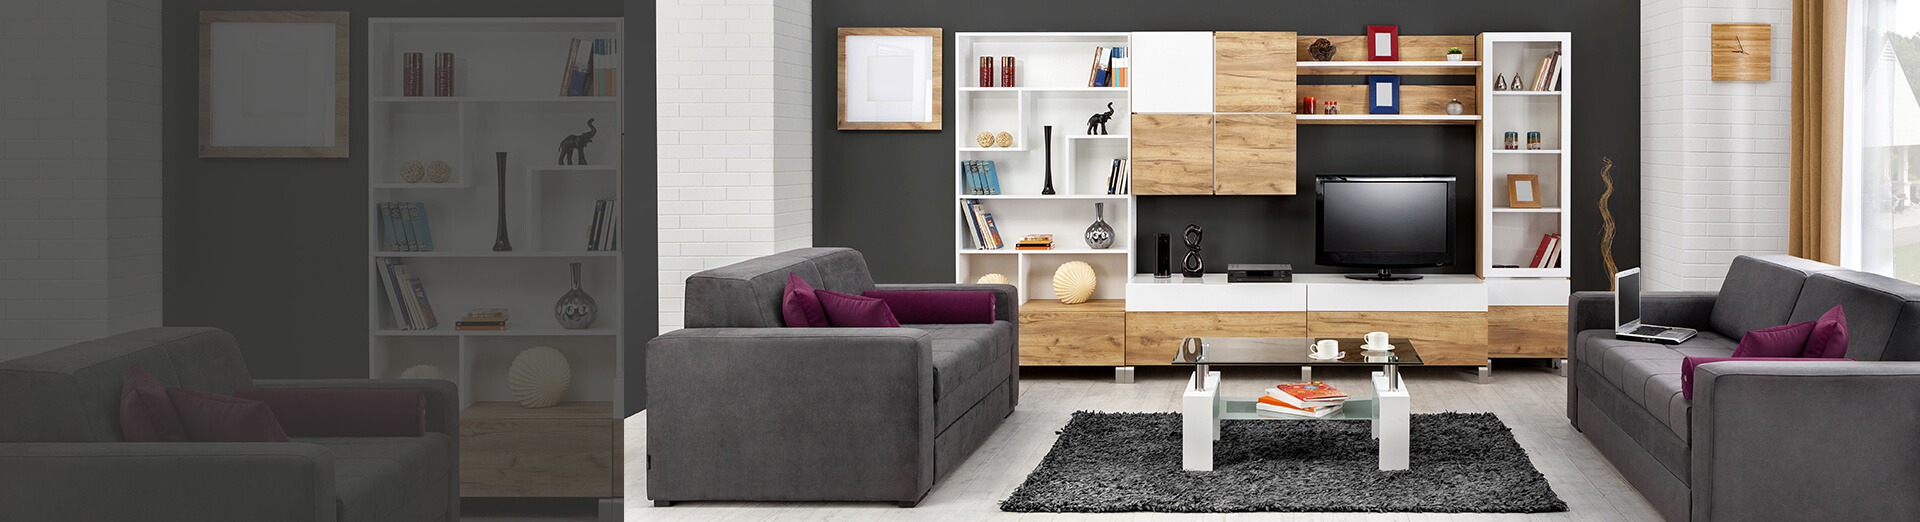 interior-furniture-home-slider